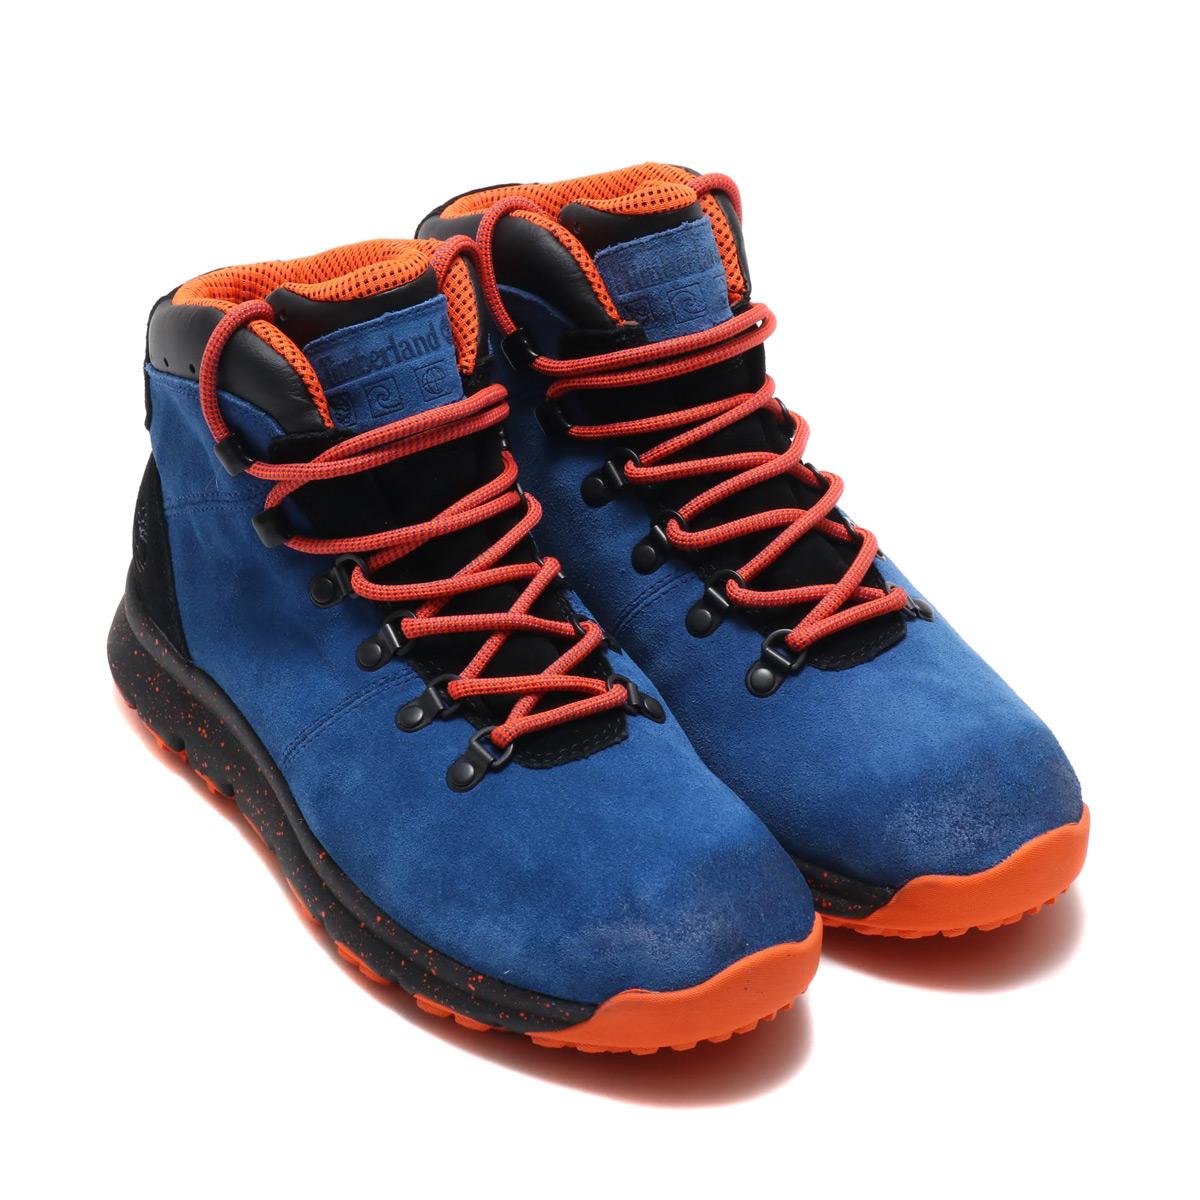 Timberland WORLD HIKER (ティンバーランド ワールド ハイカー)Medium Blue Suede【メンズ ブーツ】18FA-I